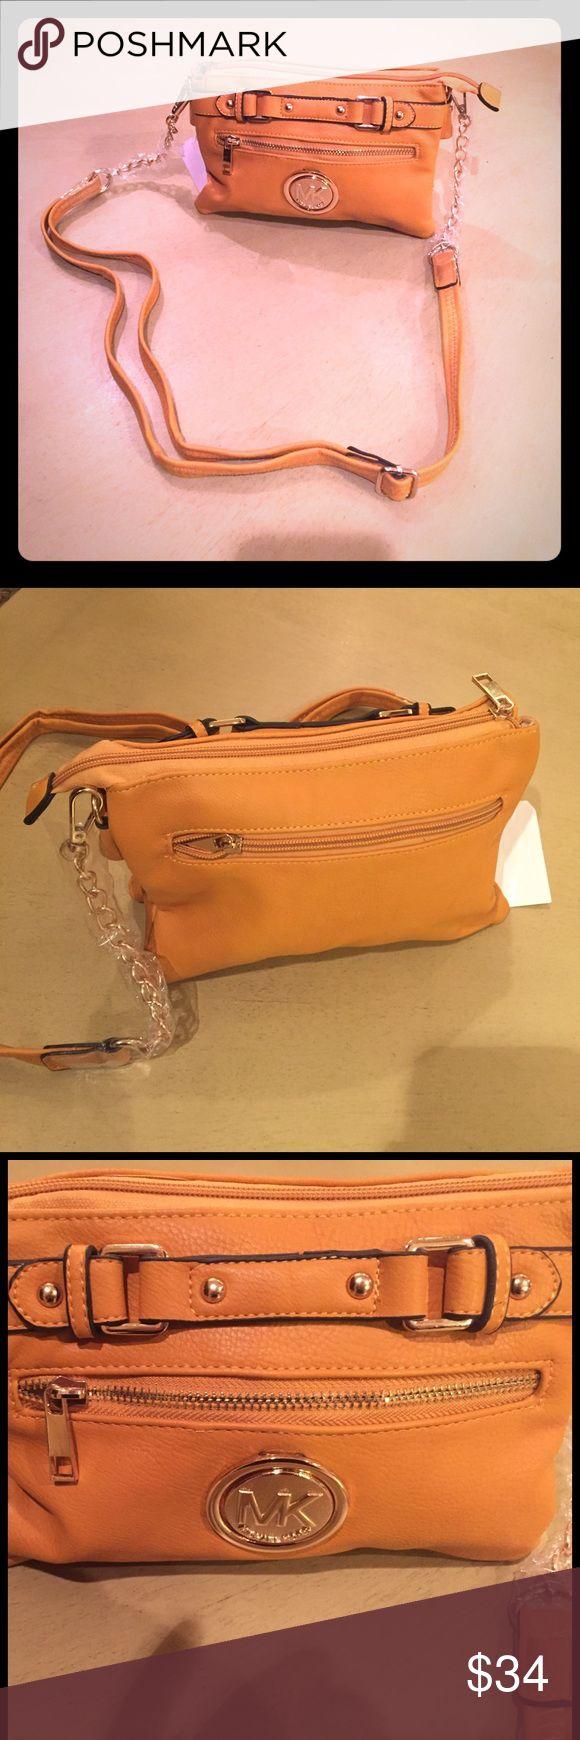 Michael kors Handbag This is brand new replica Handbag and fraction of cost. Cross body yellow with handle has good touch. KORS Michael Kors Bags Crossbody Bags